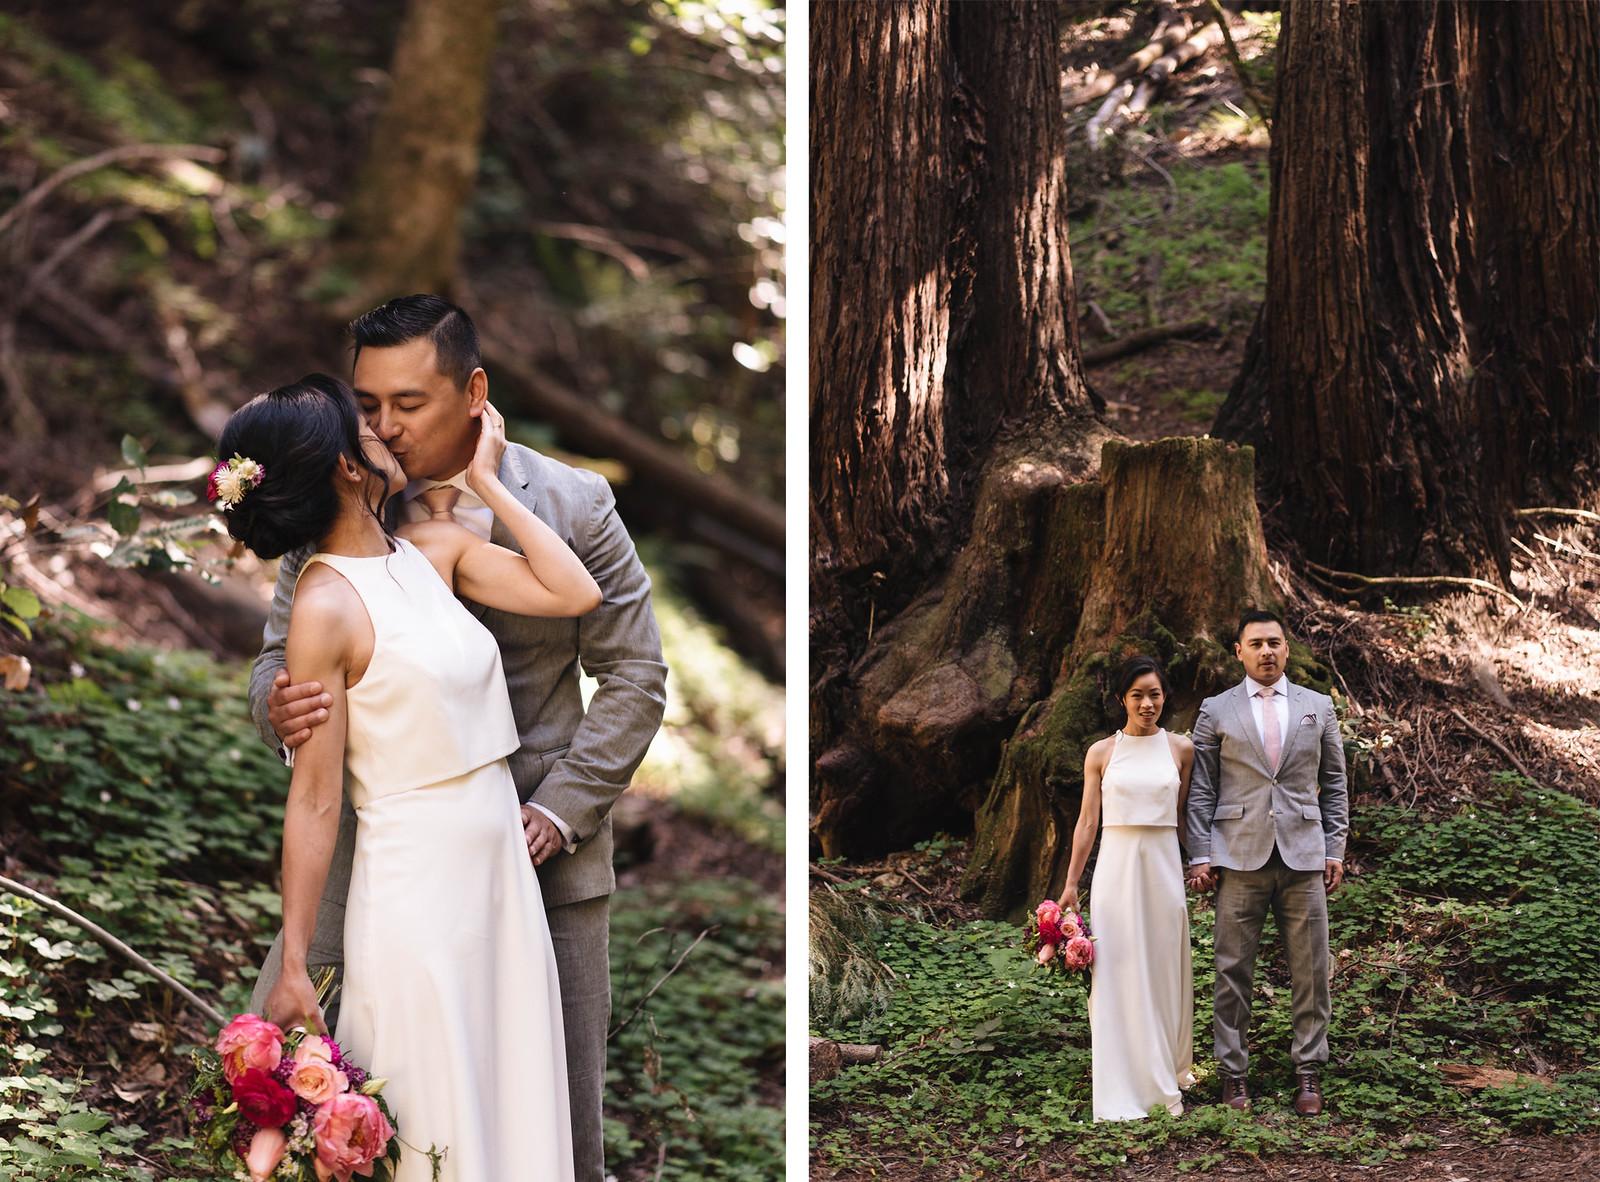 northern-california-saratoga-springs-wedding-photographer on juliettelaura.com